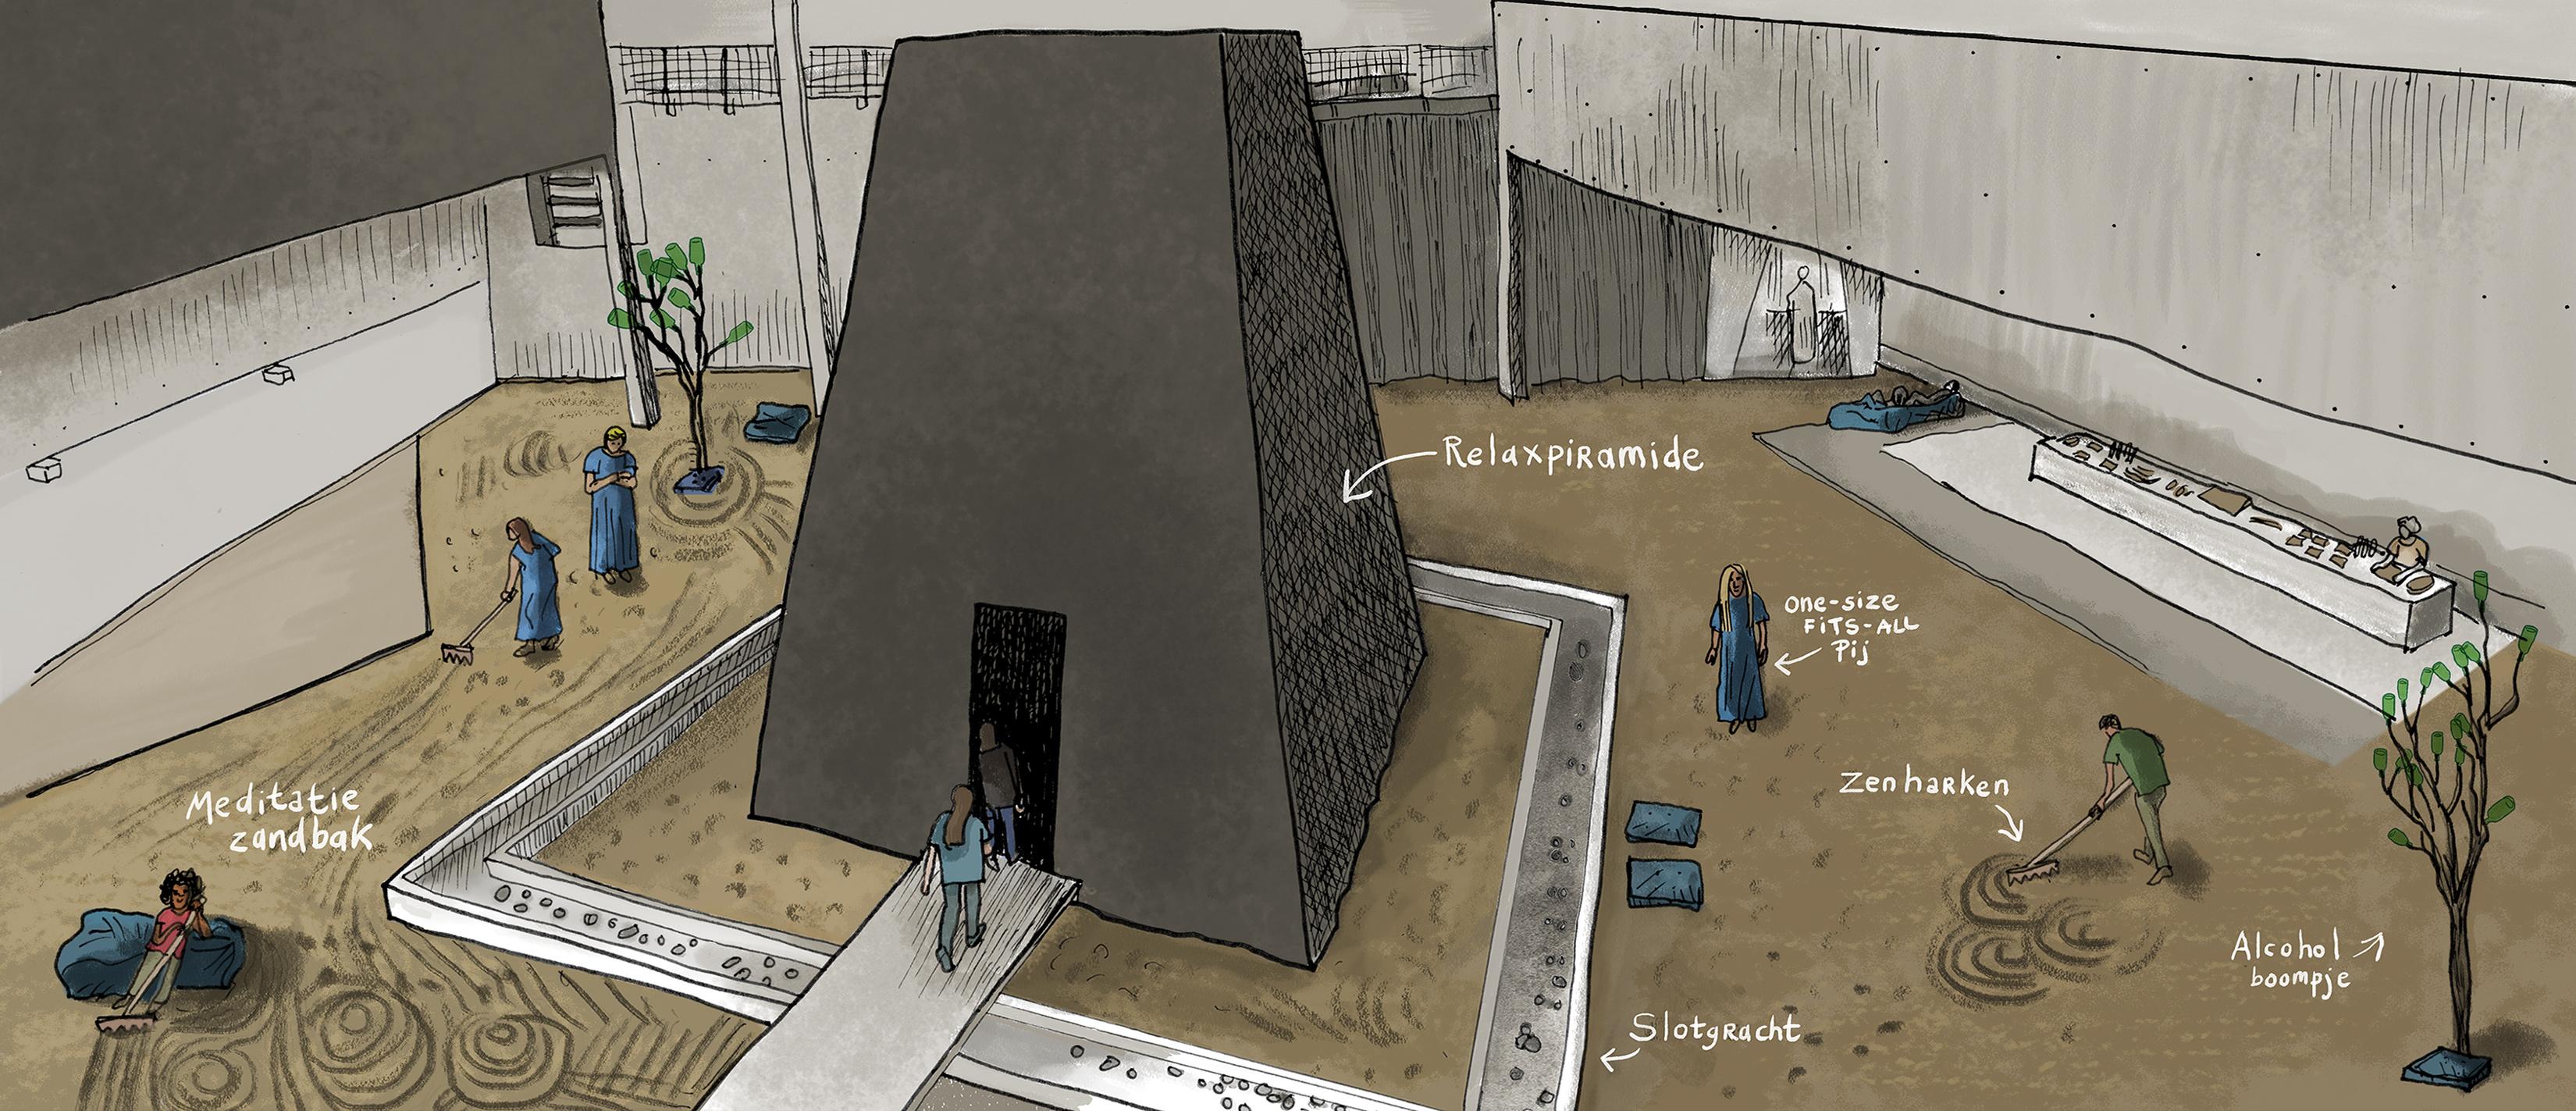 Vers-Beton—Ik-rotterdam—GD_THYSELF_nwinstituut